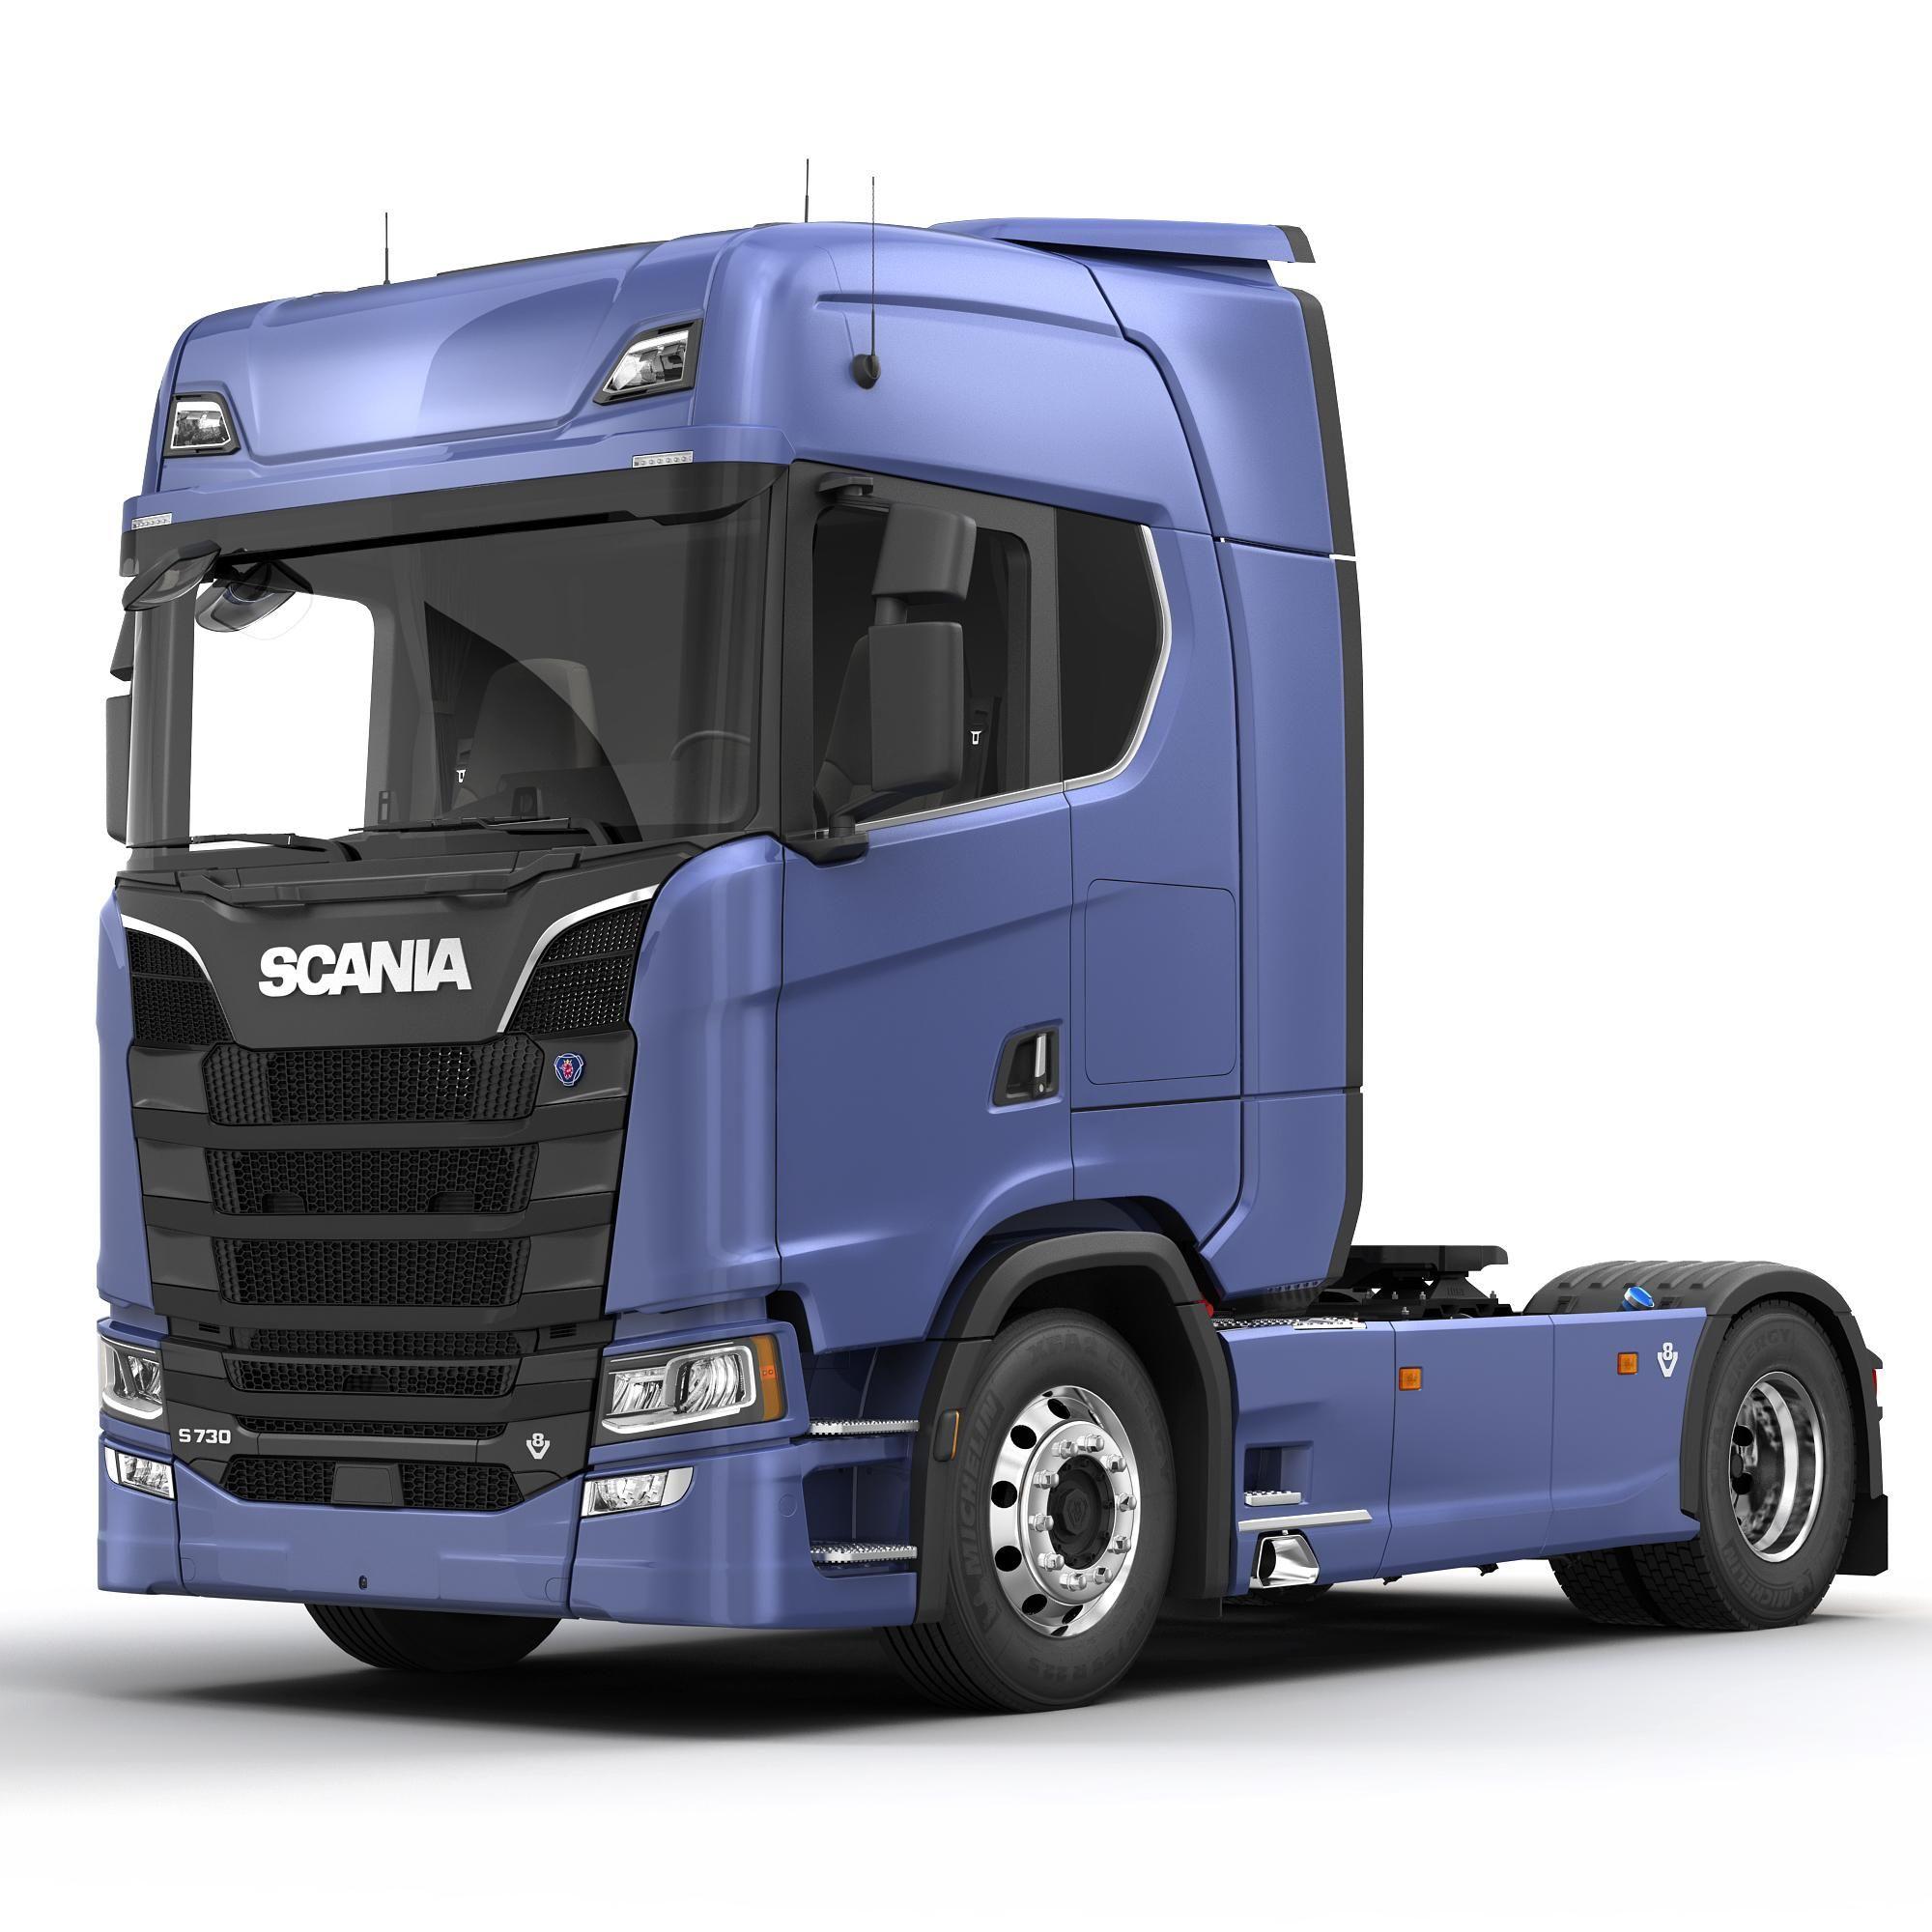 Scania S730 Semi Truck 3d Model Ad Scania Semi Model Truck